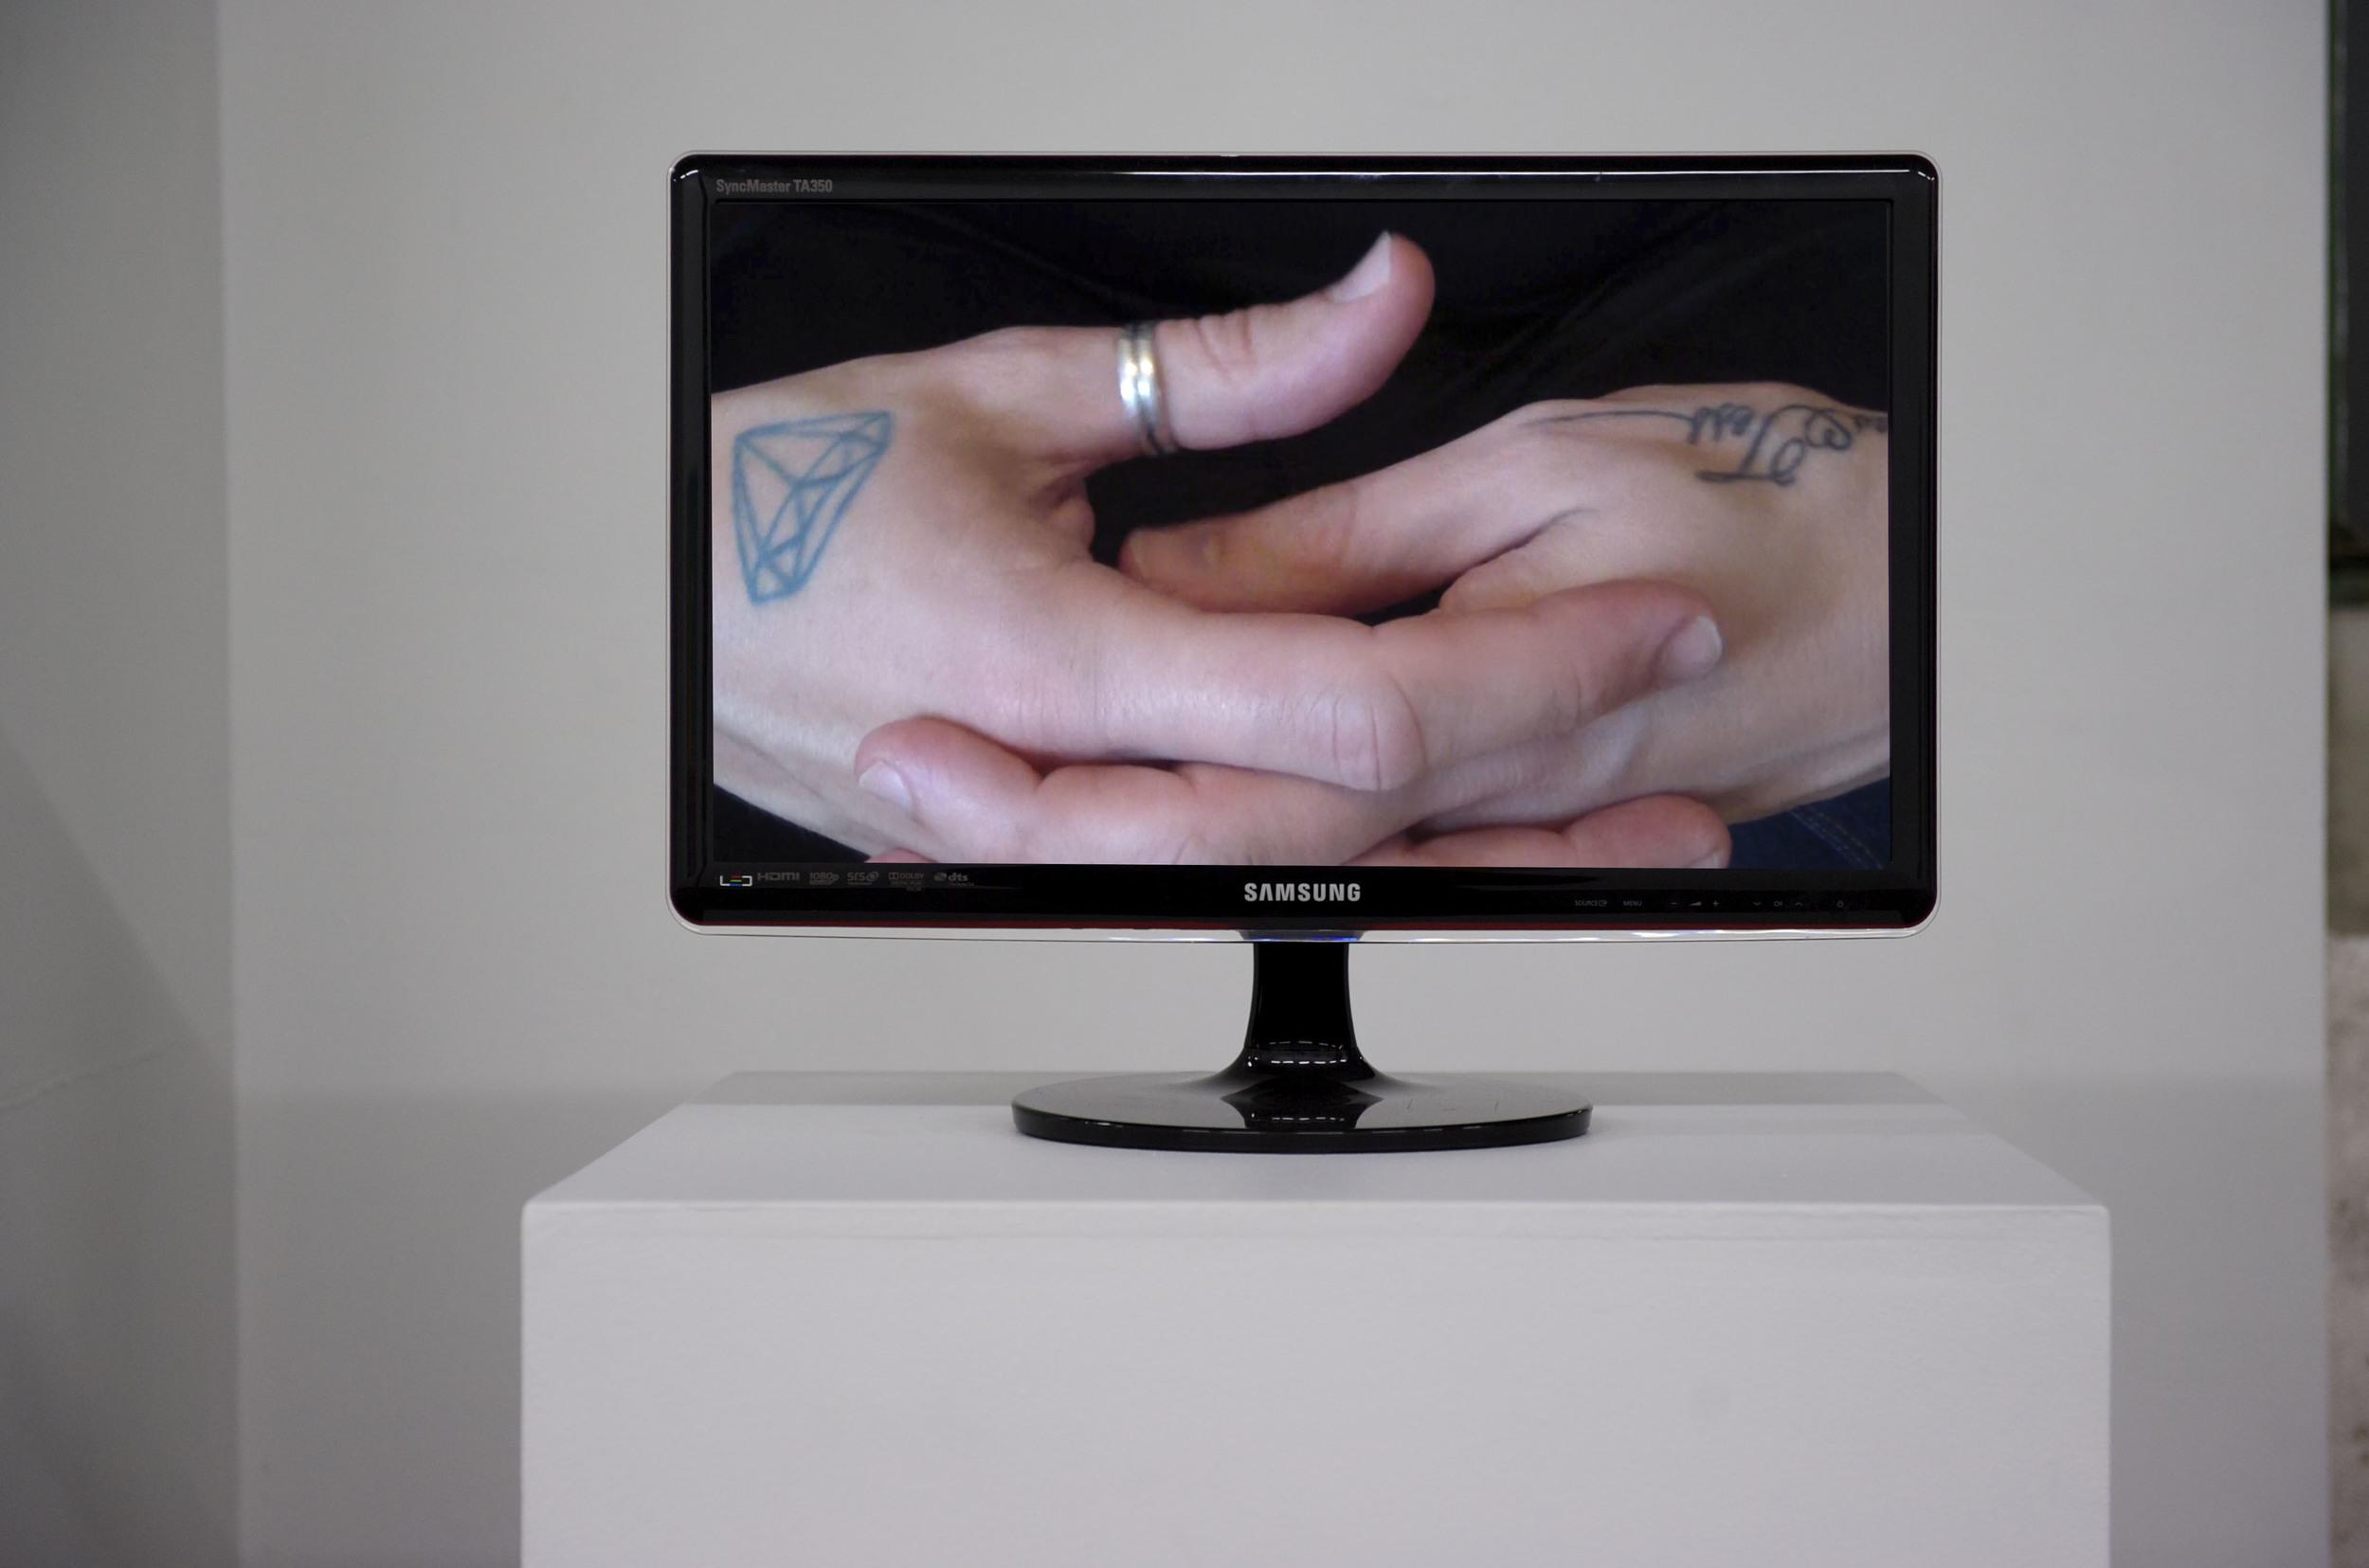 Twiddling My Thumbs (installation)  2014  HD digital video transferred to Blu-ray, silent  1 sec (looped)